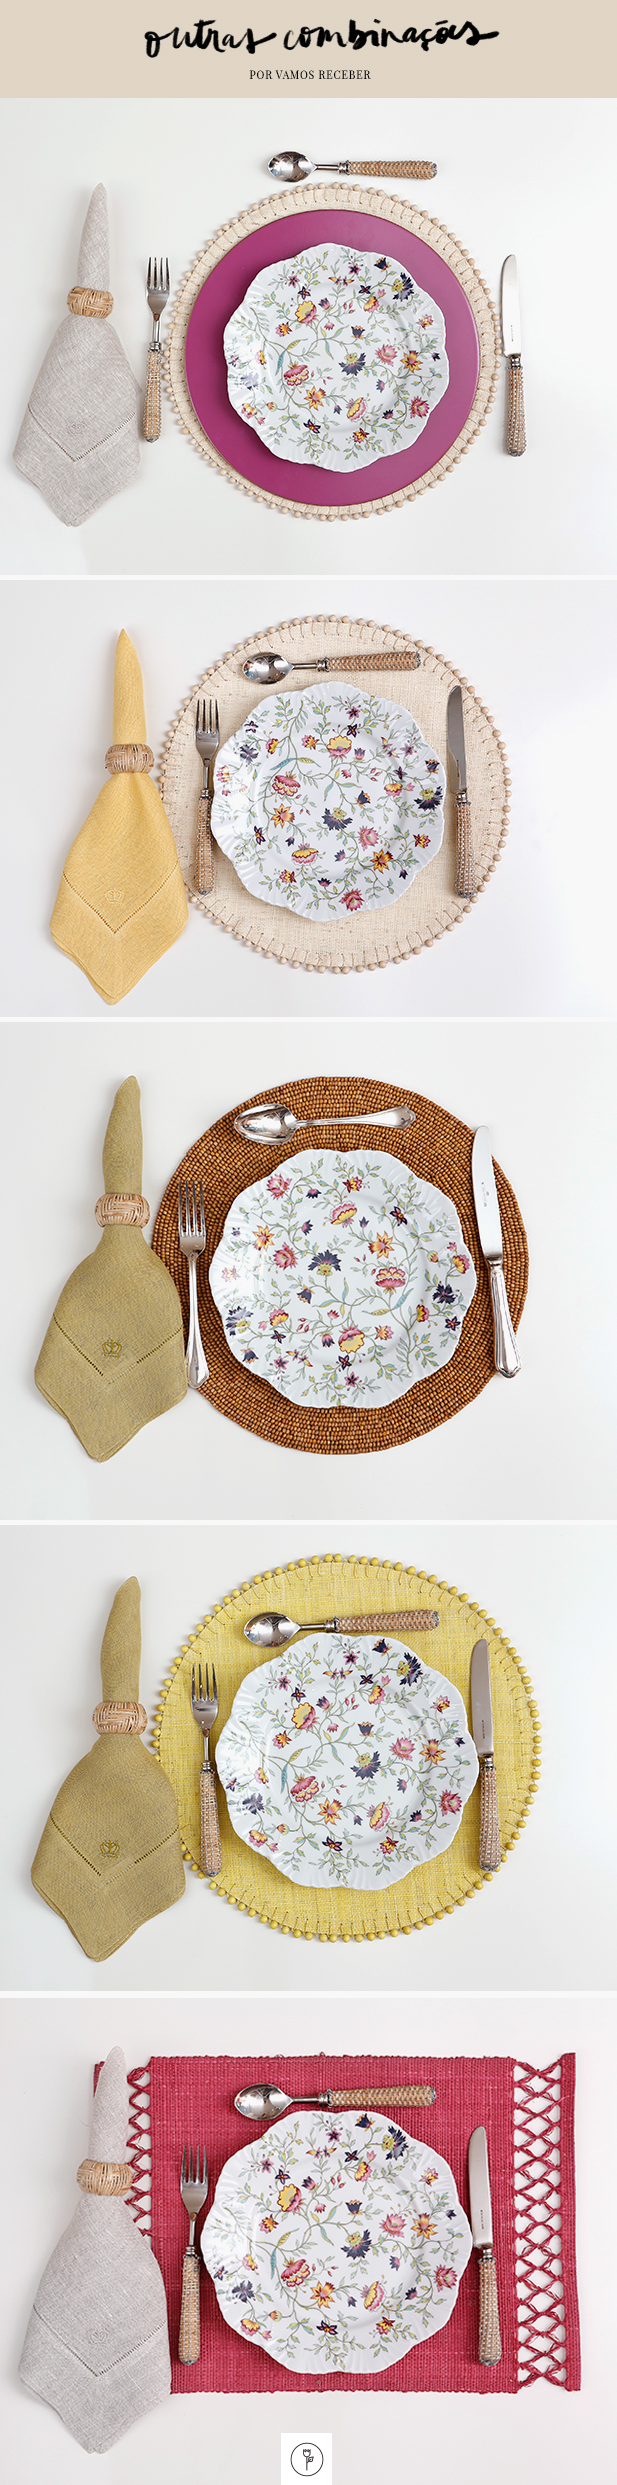 lista tb - fleur royal -outras combinacoes